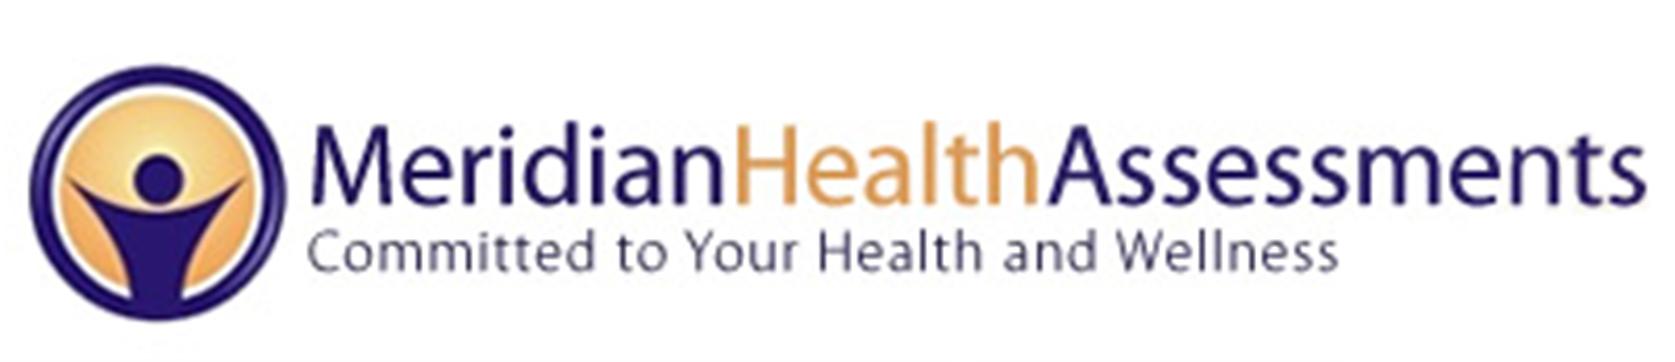 Meridian Health Assessments Logo